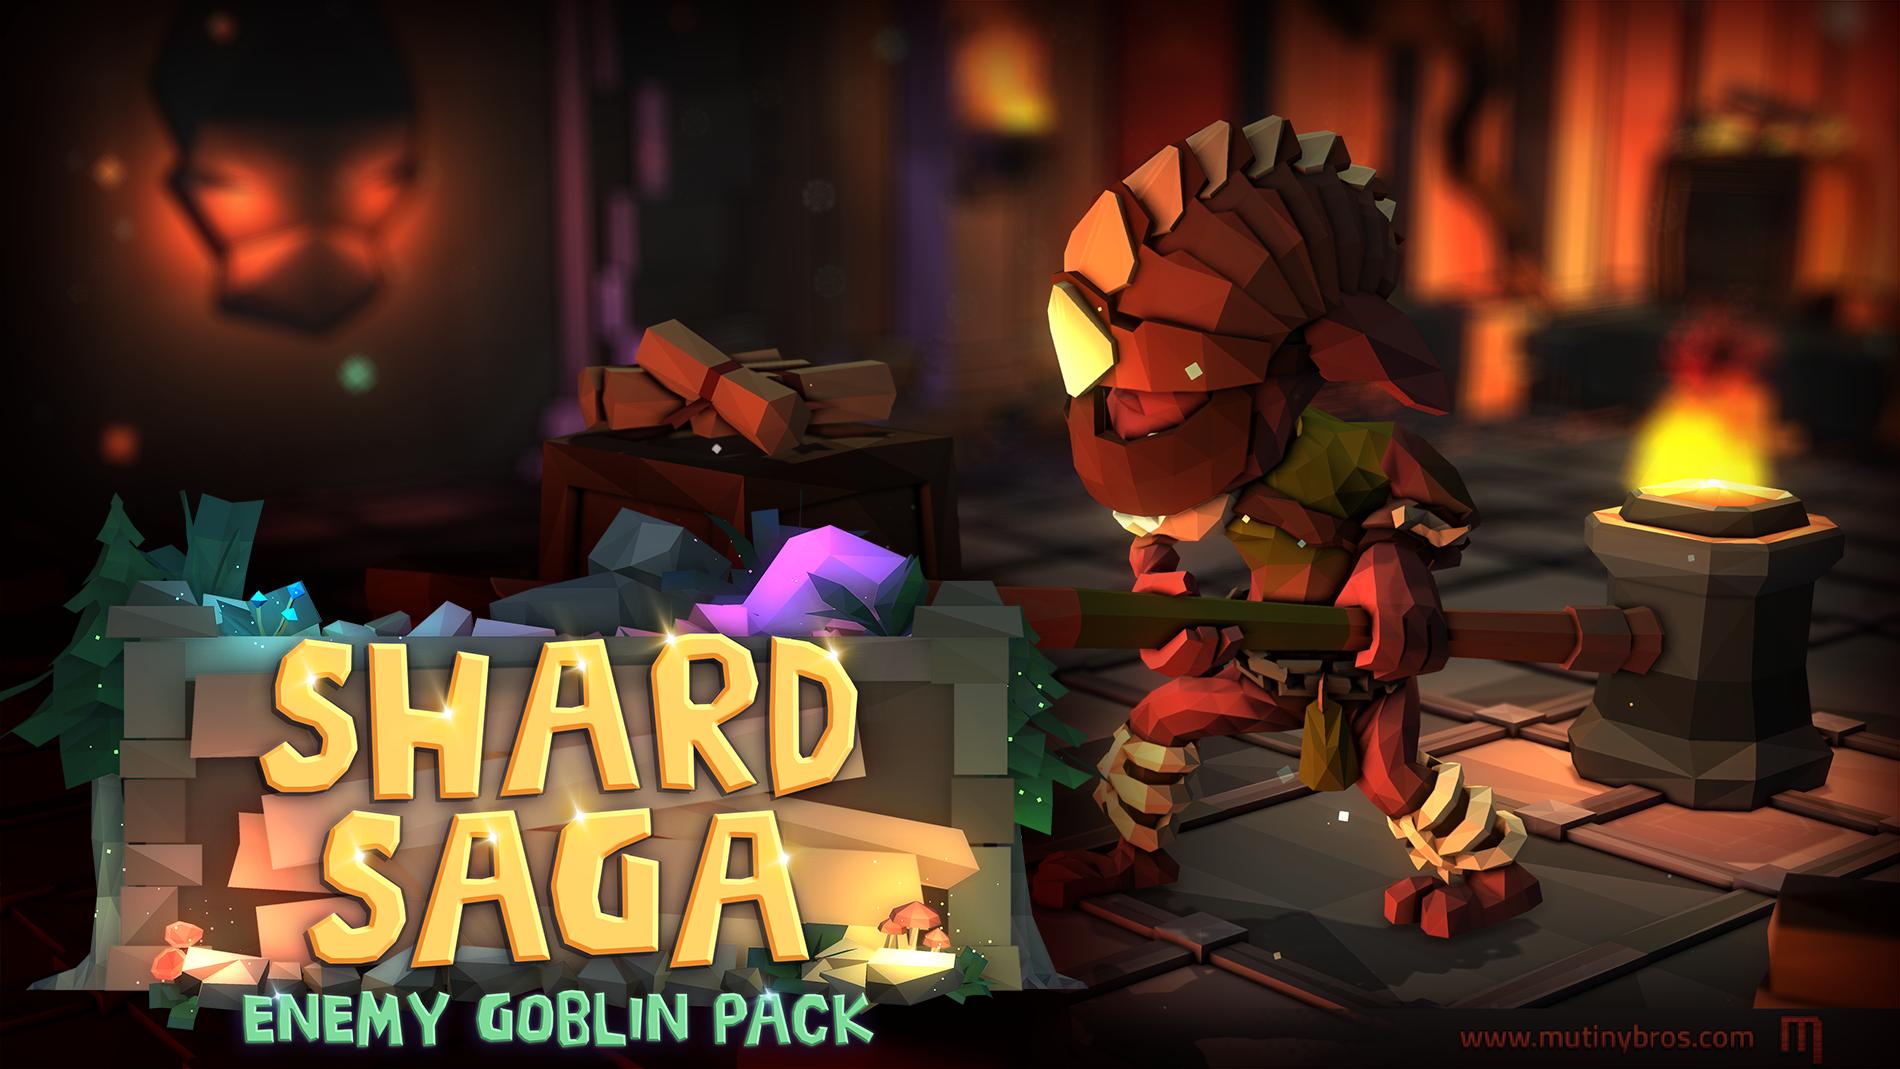 Shard Saga: Enemy Goblin Pack